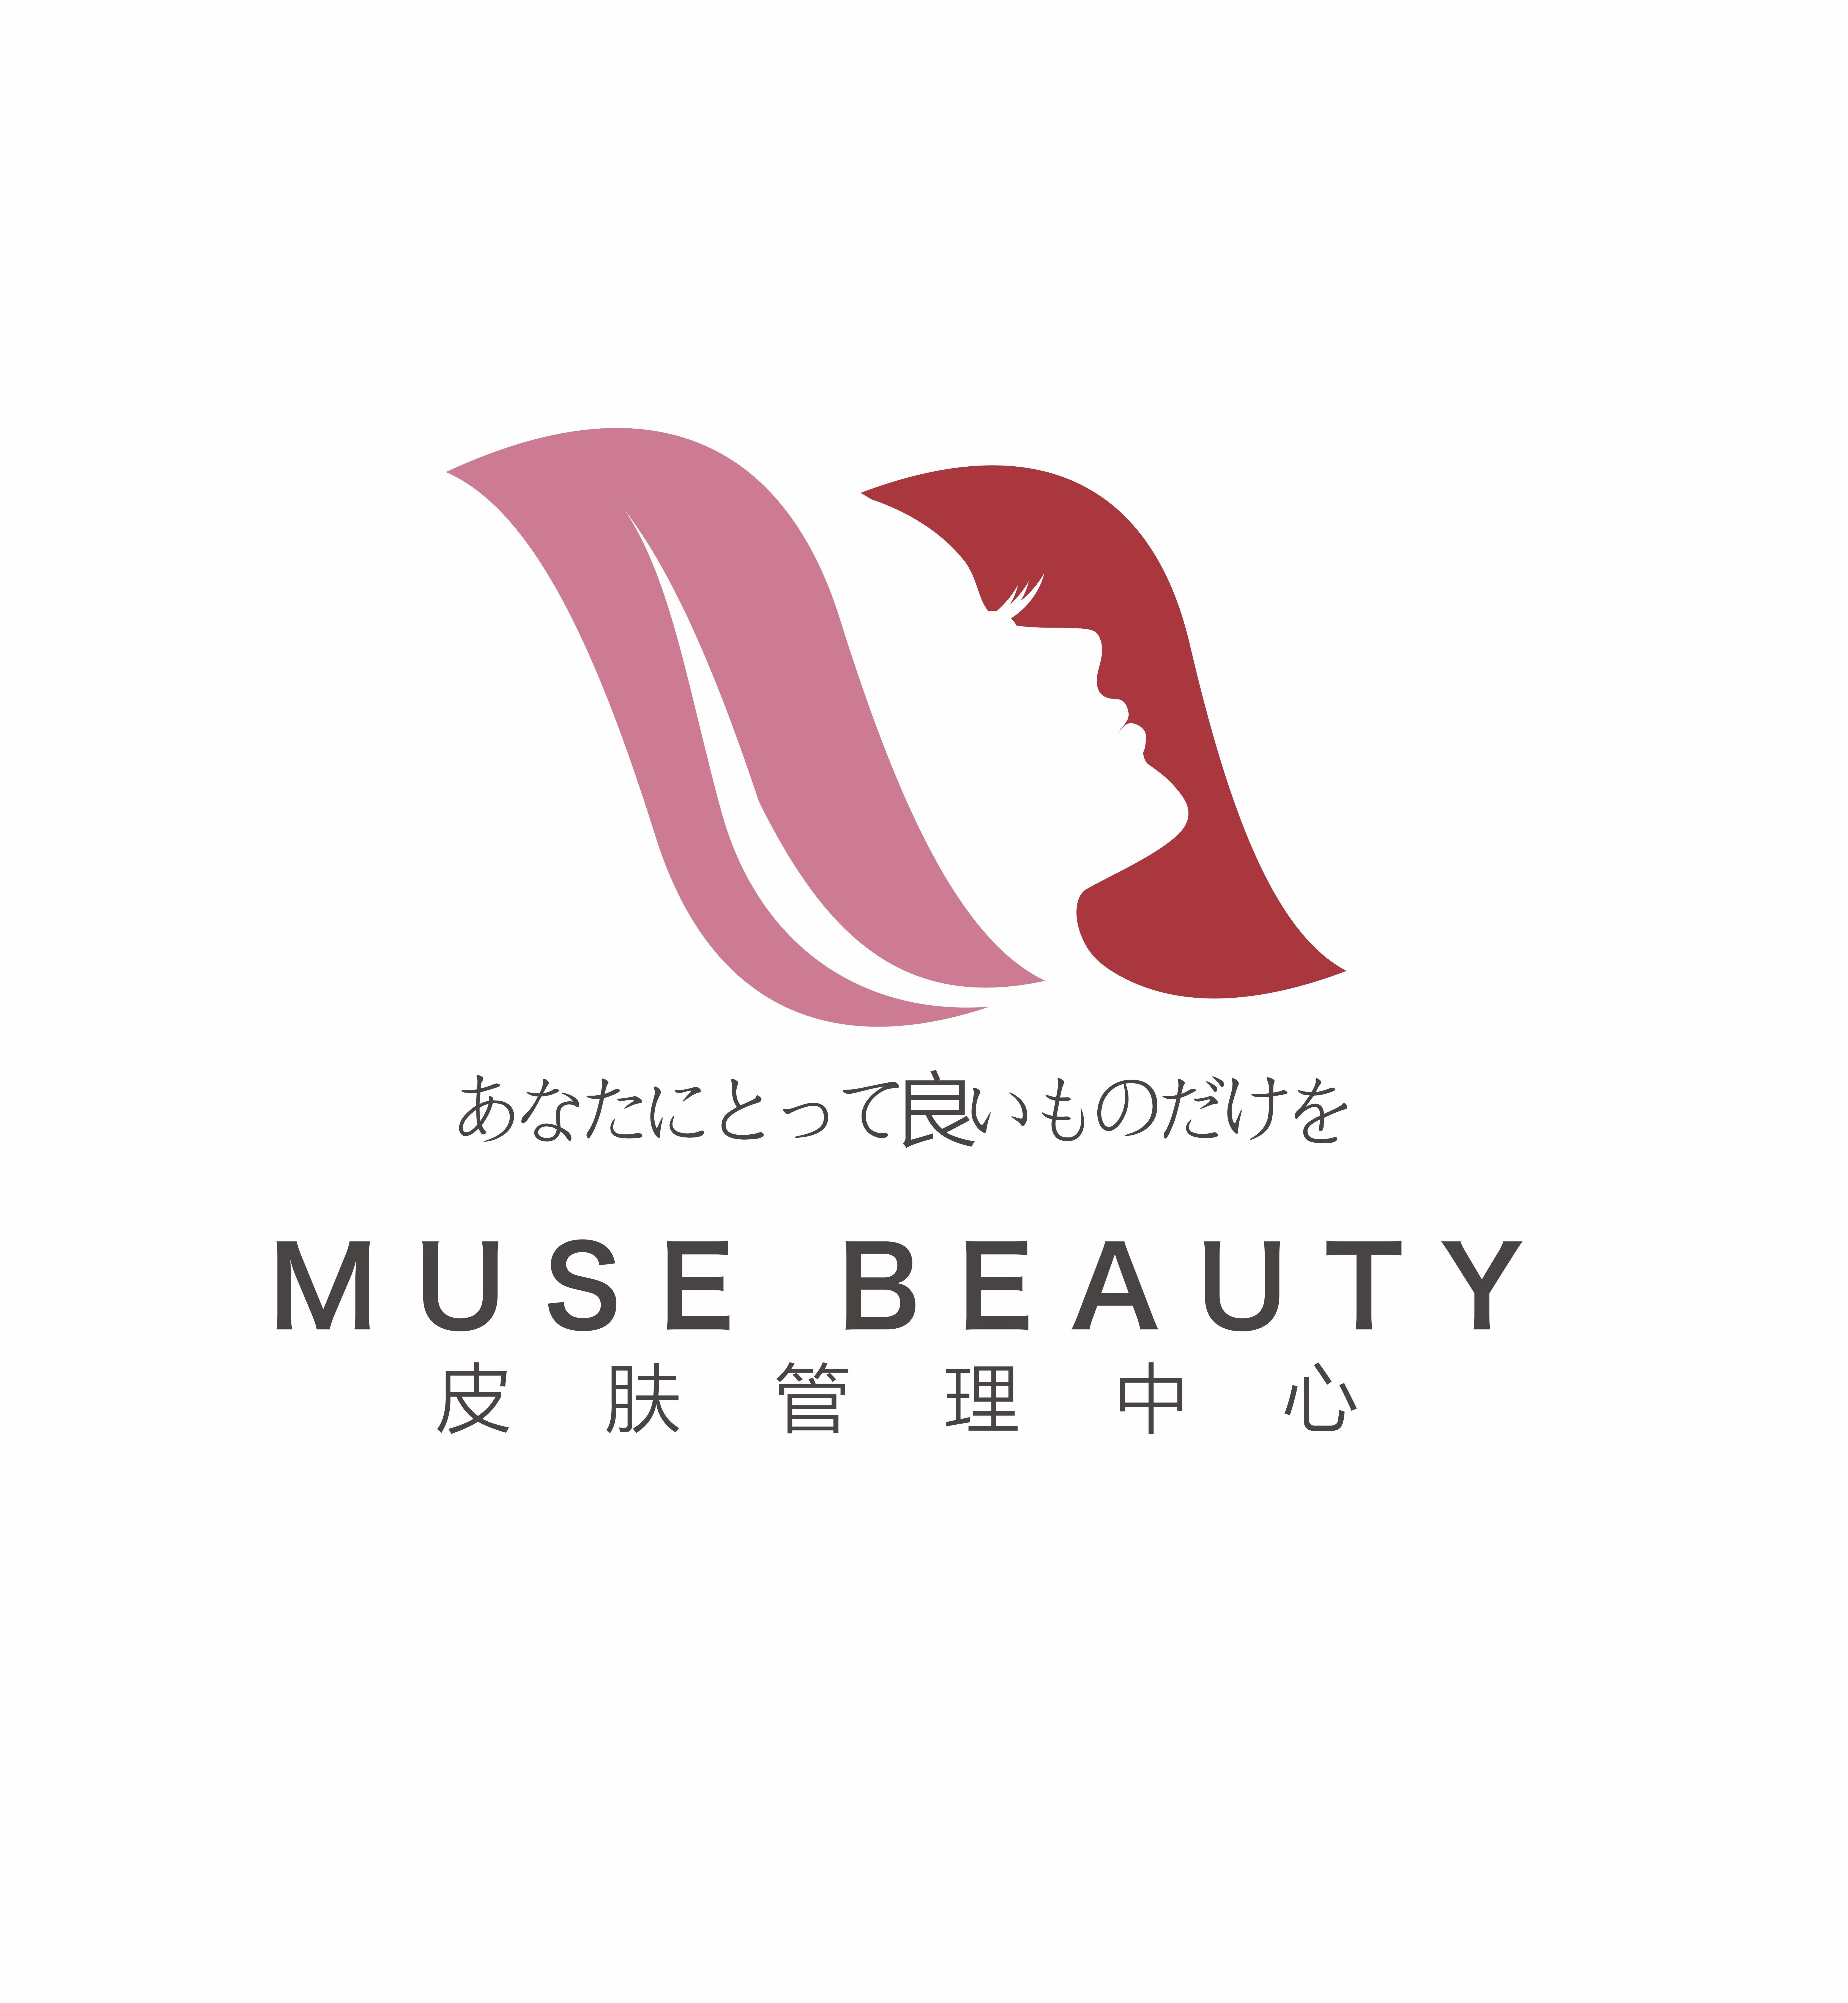 MUSE BEAUTY皮肤管理中心(北城店)